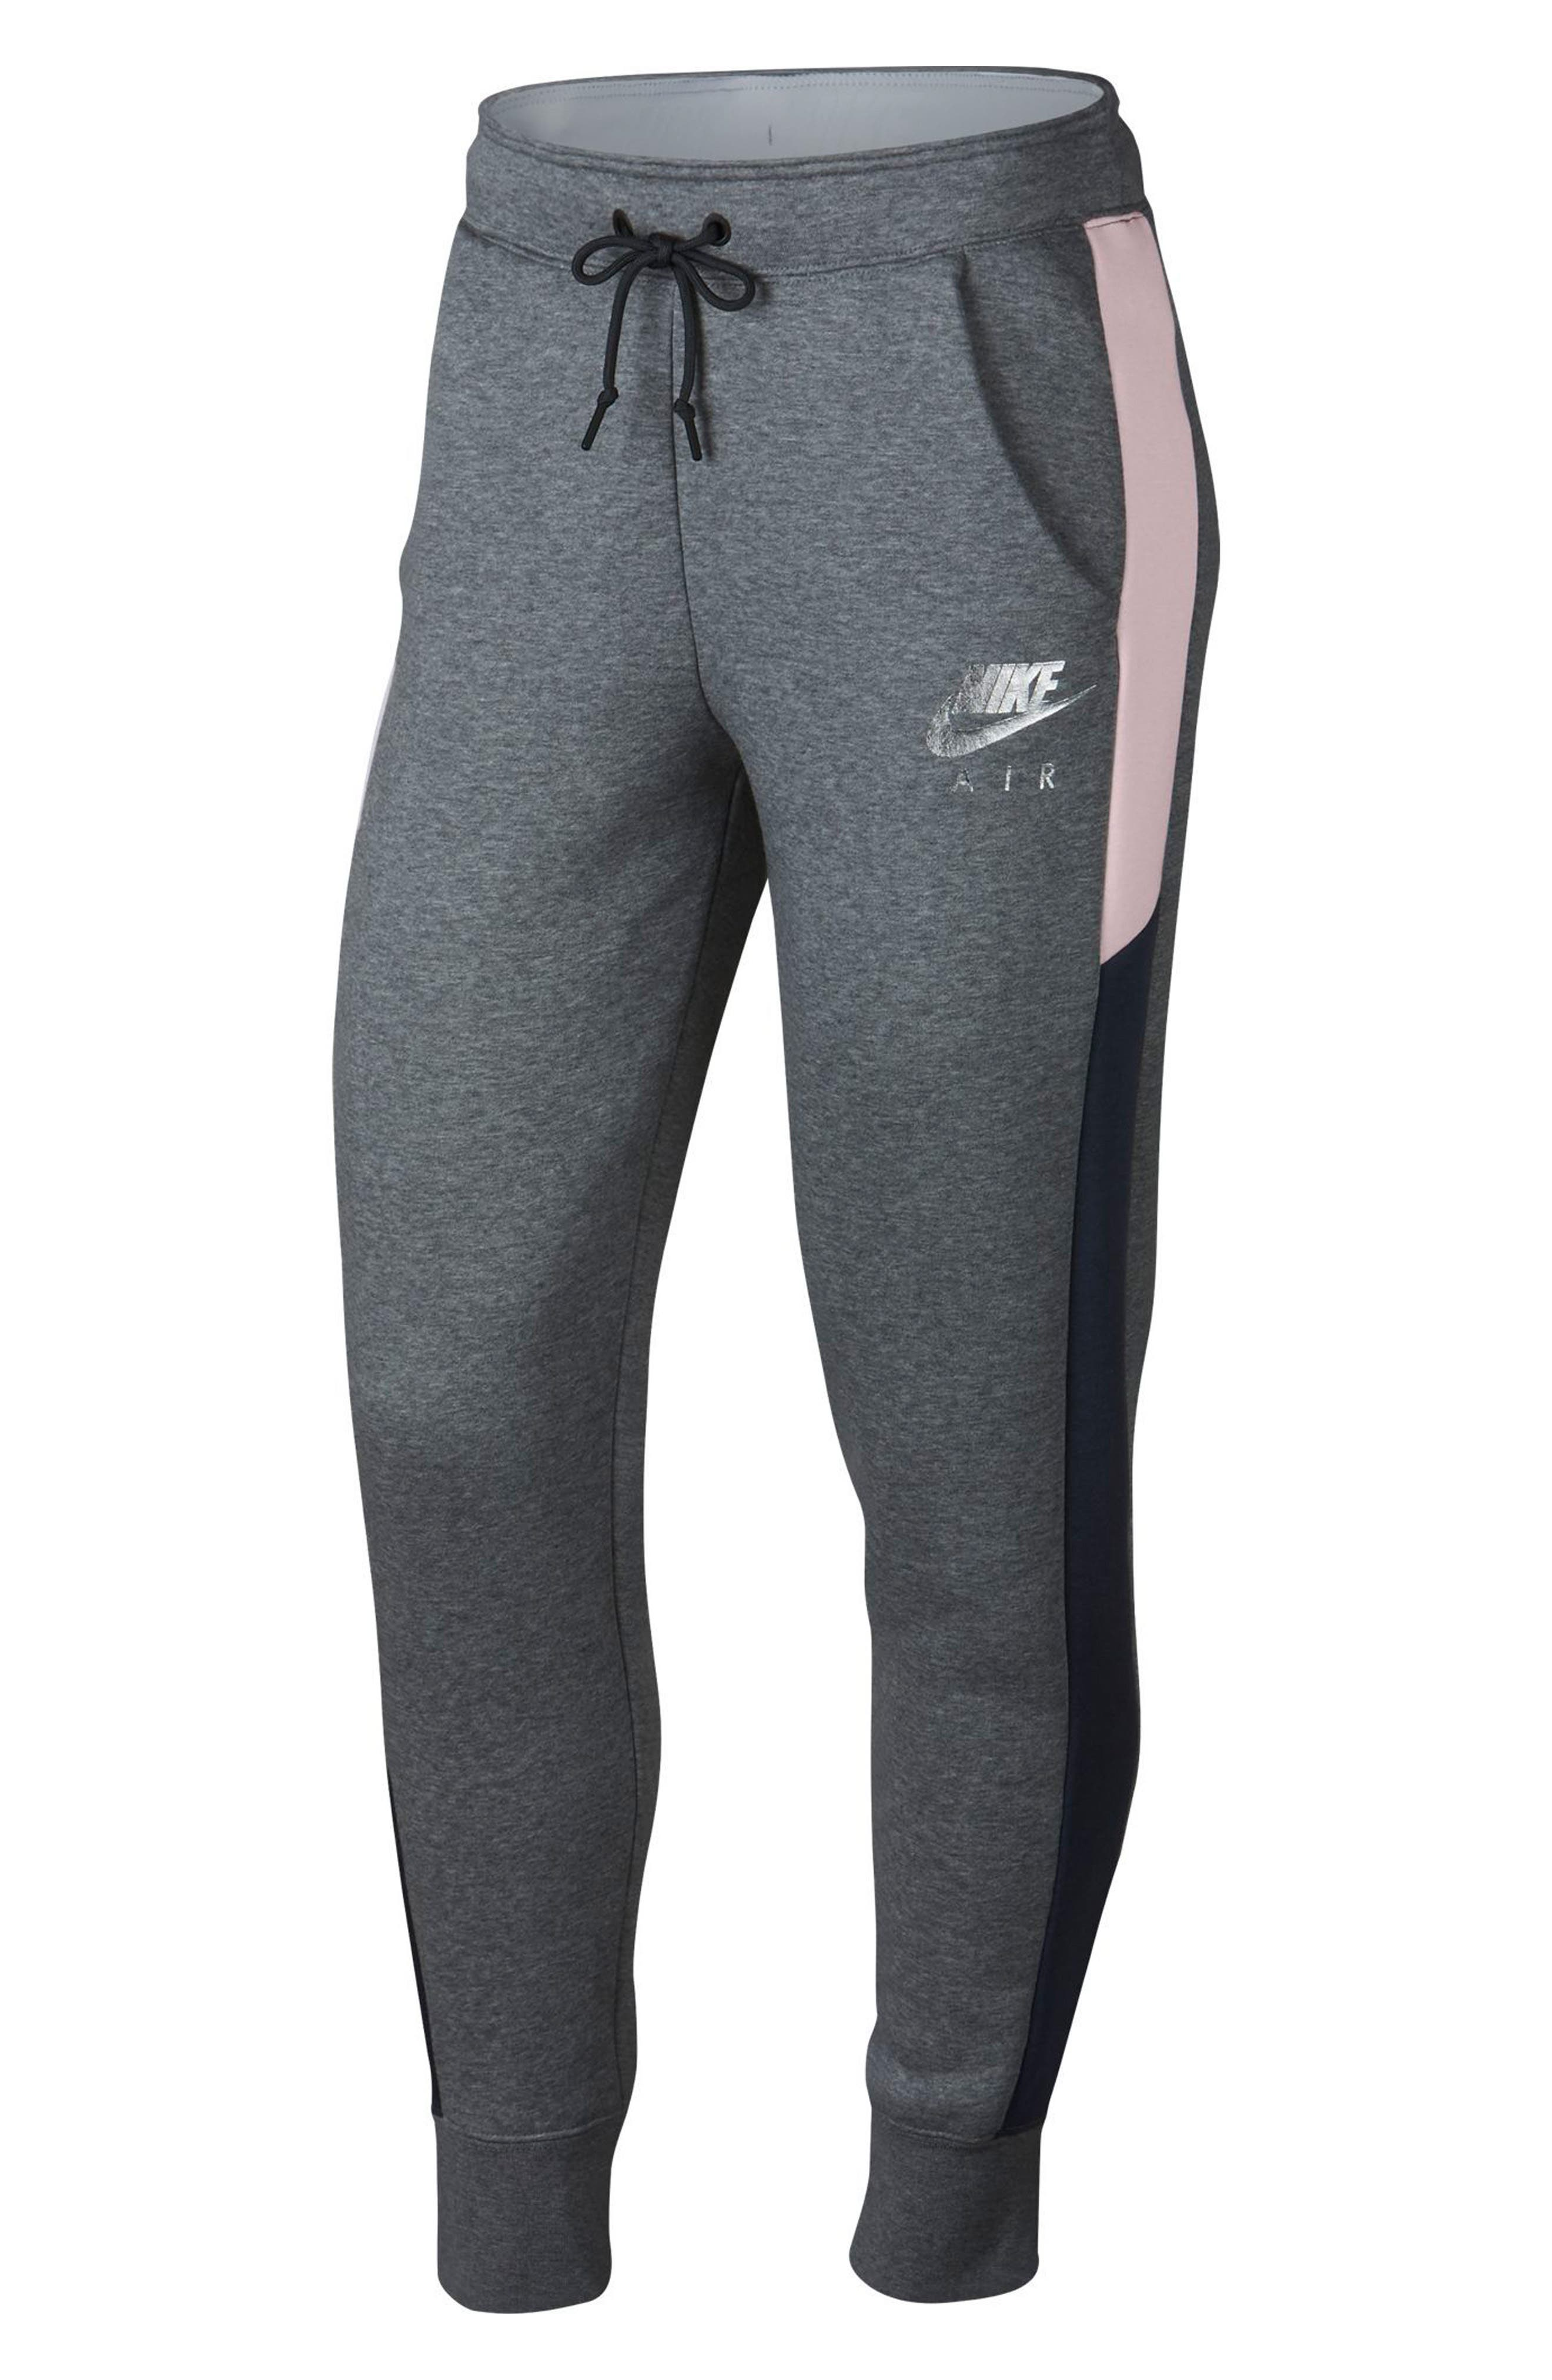 Sportswear Women's Rally Pants,                         Main,                         color, CARBON HTR/ OBSIDIAN/ PINK